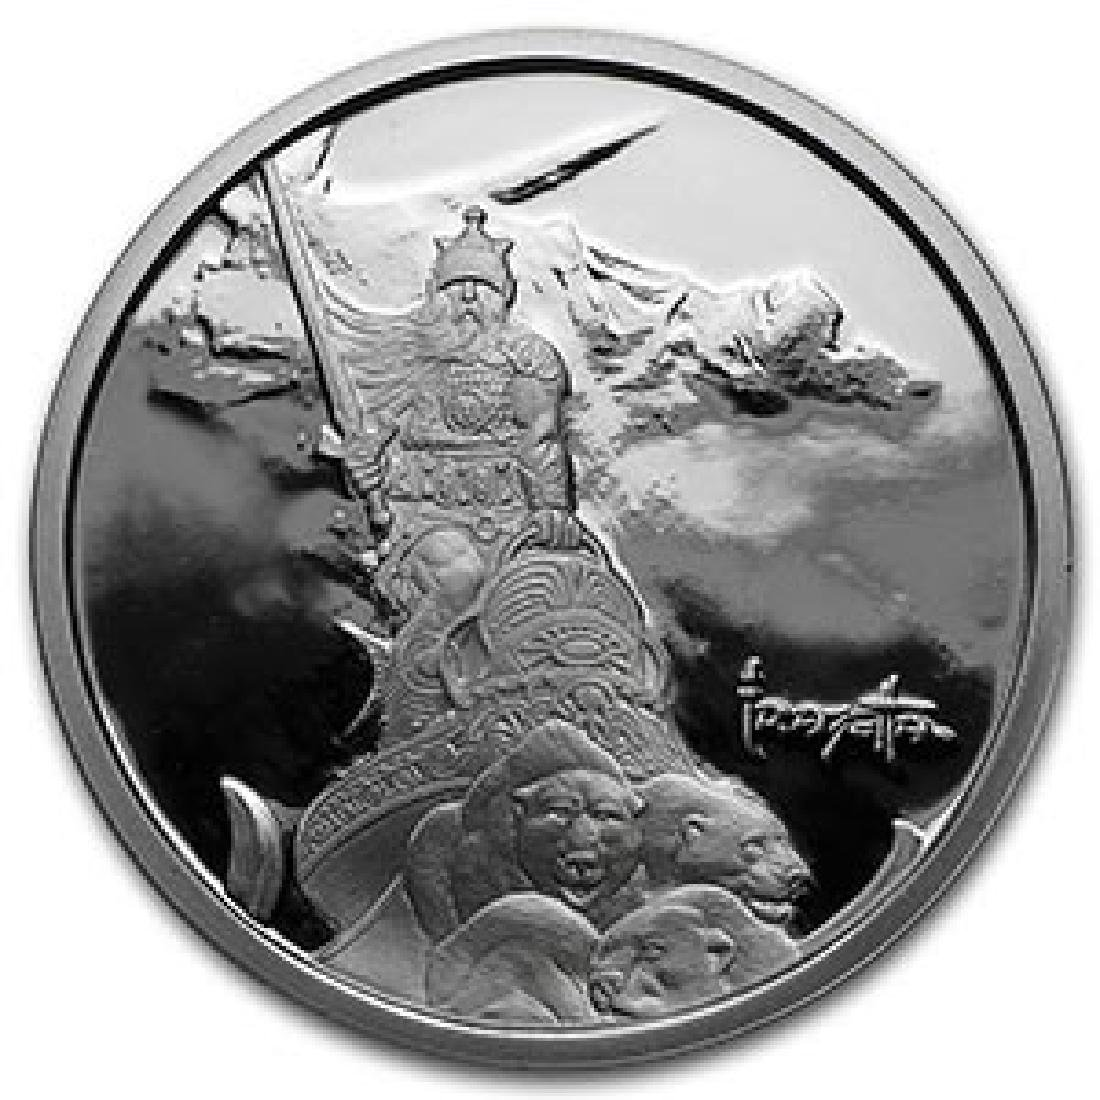 1 oz Silver Proof Round - Frank Frazetta (Silver Warrio